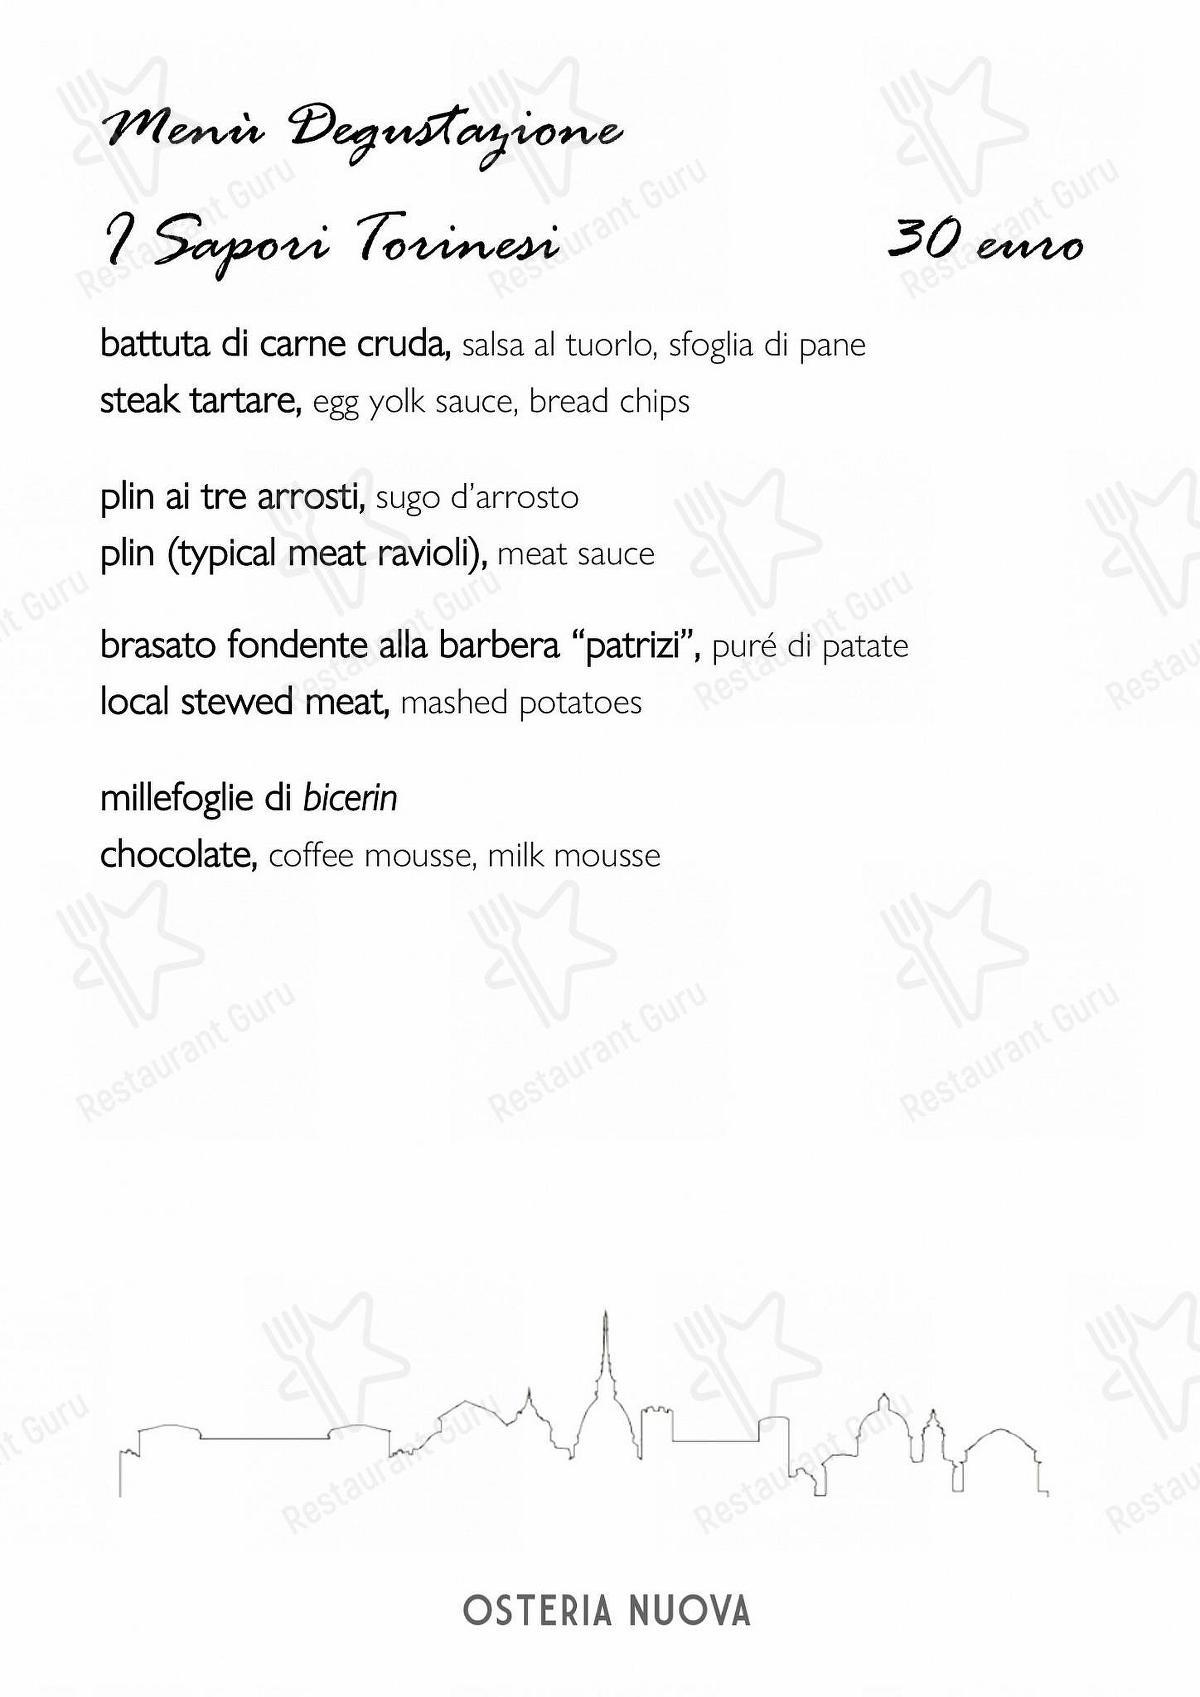 Menu di Casaslurp Osteria Nuova - piatti e bevande